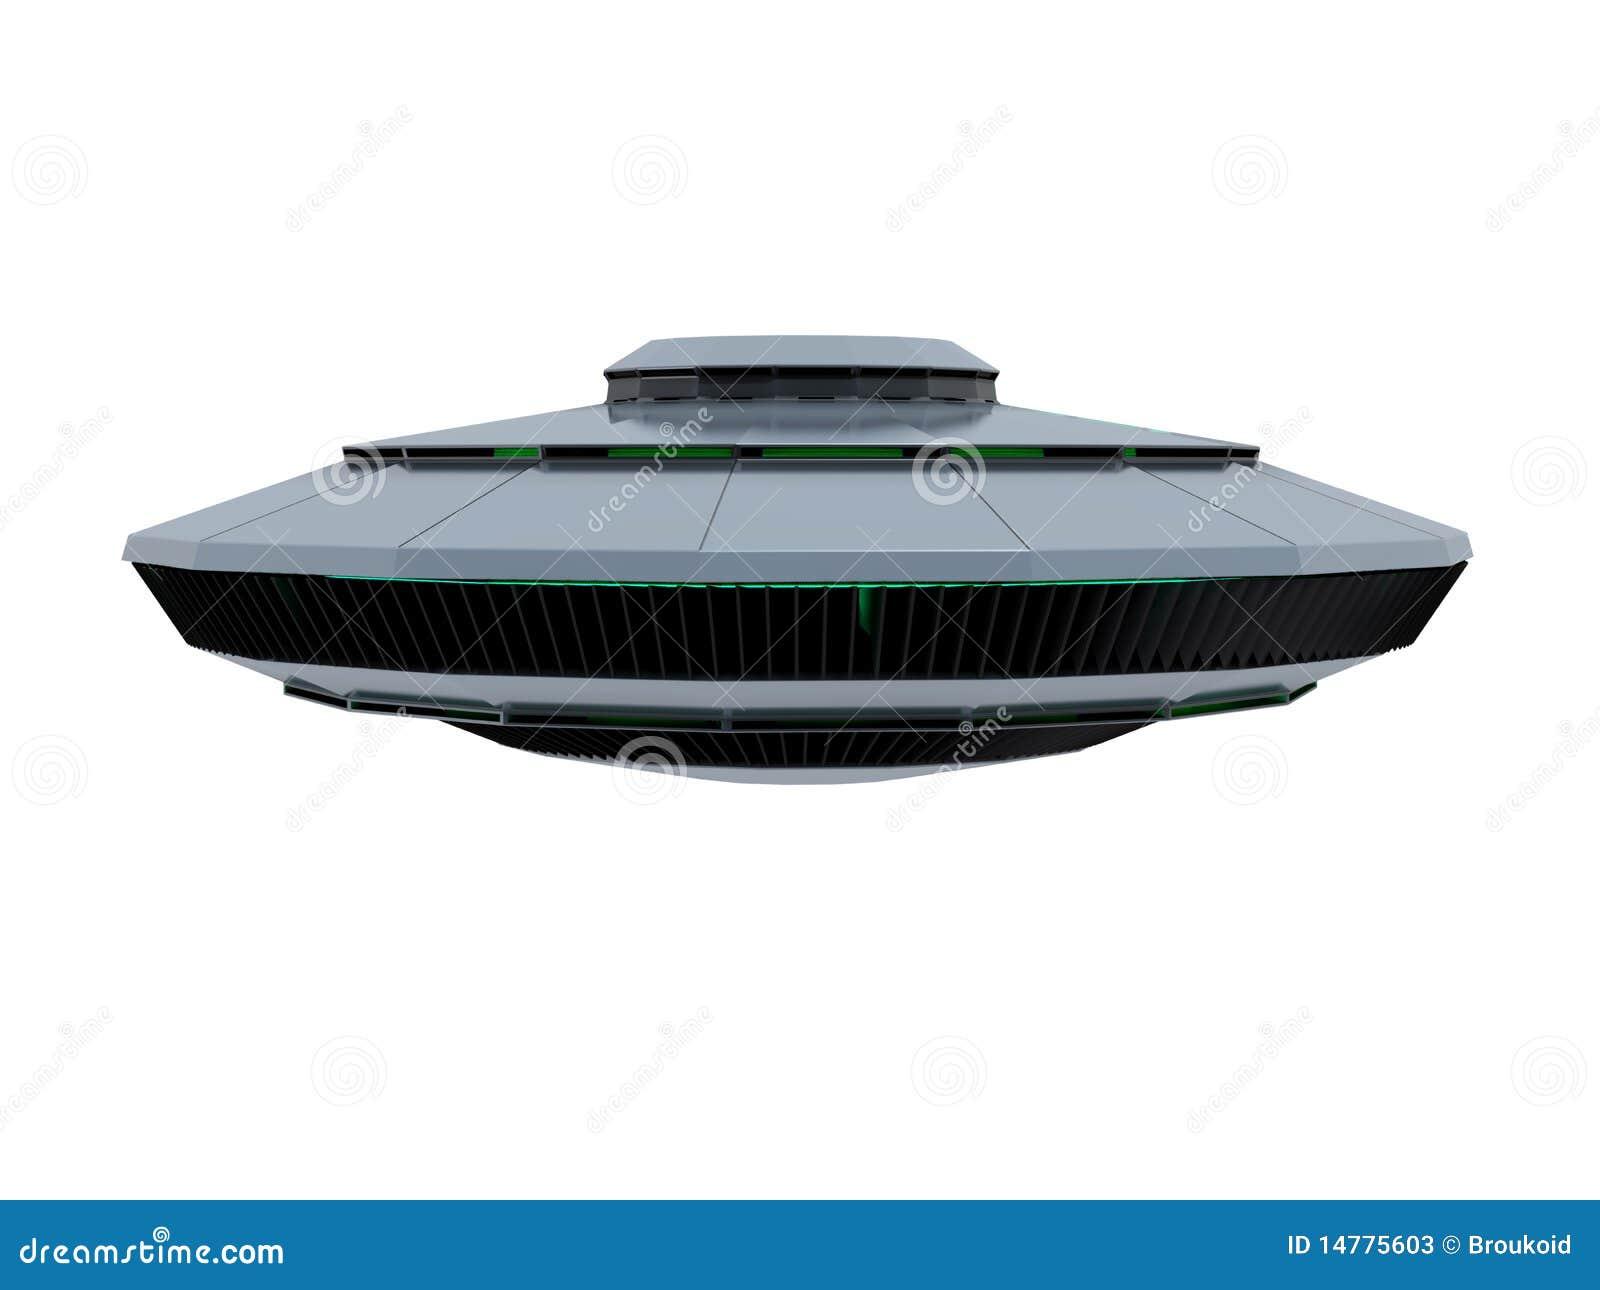 13 ufo